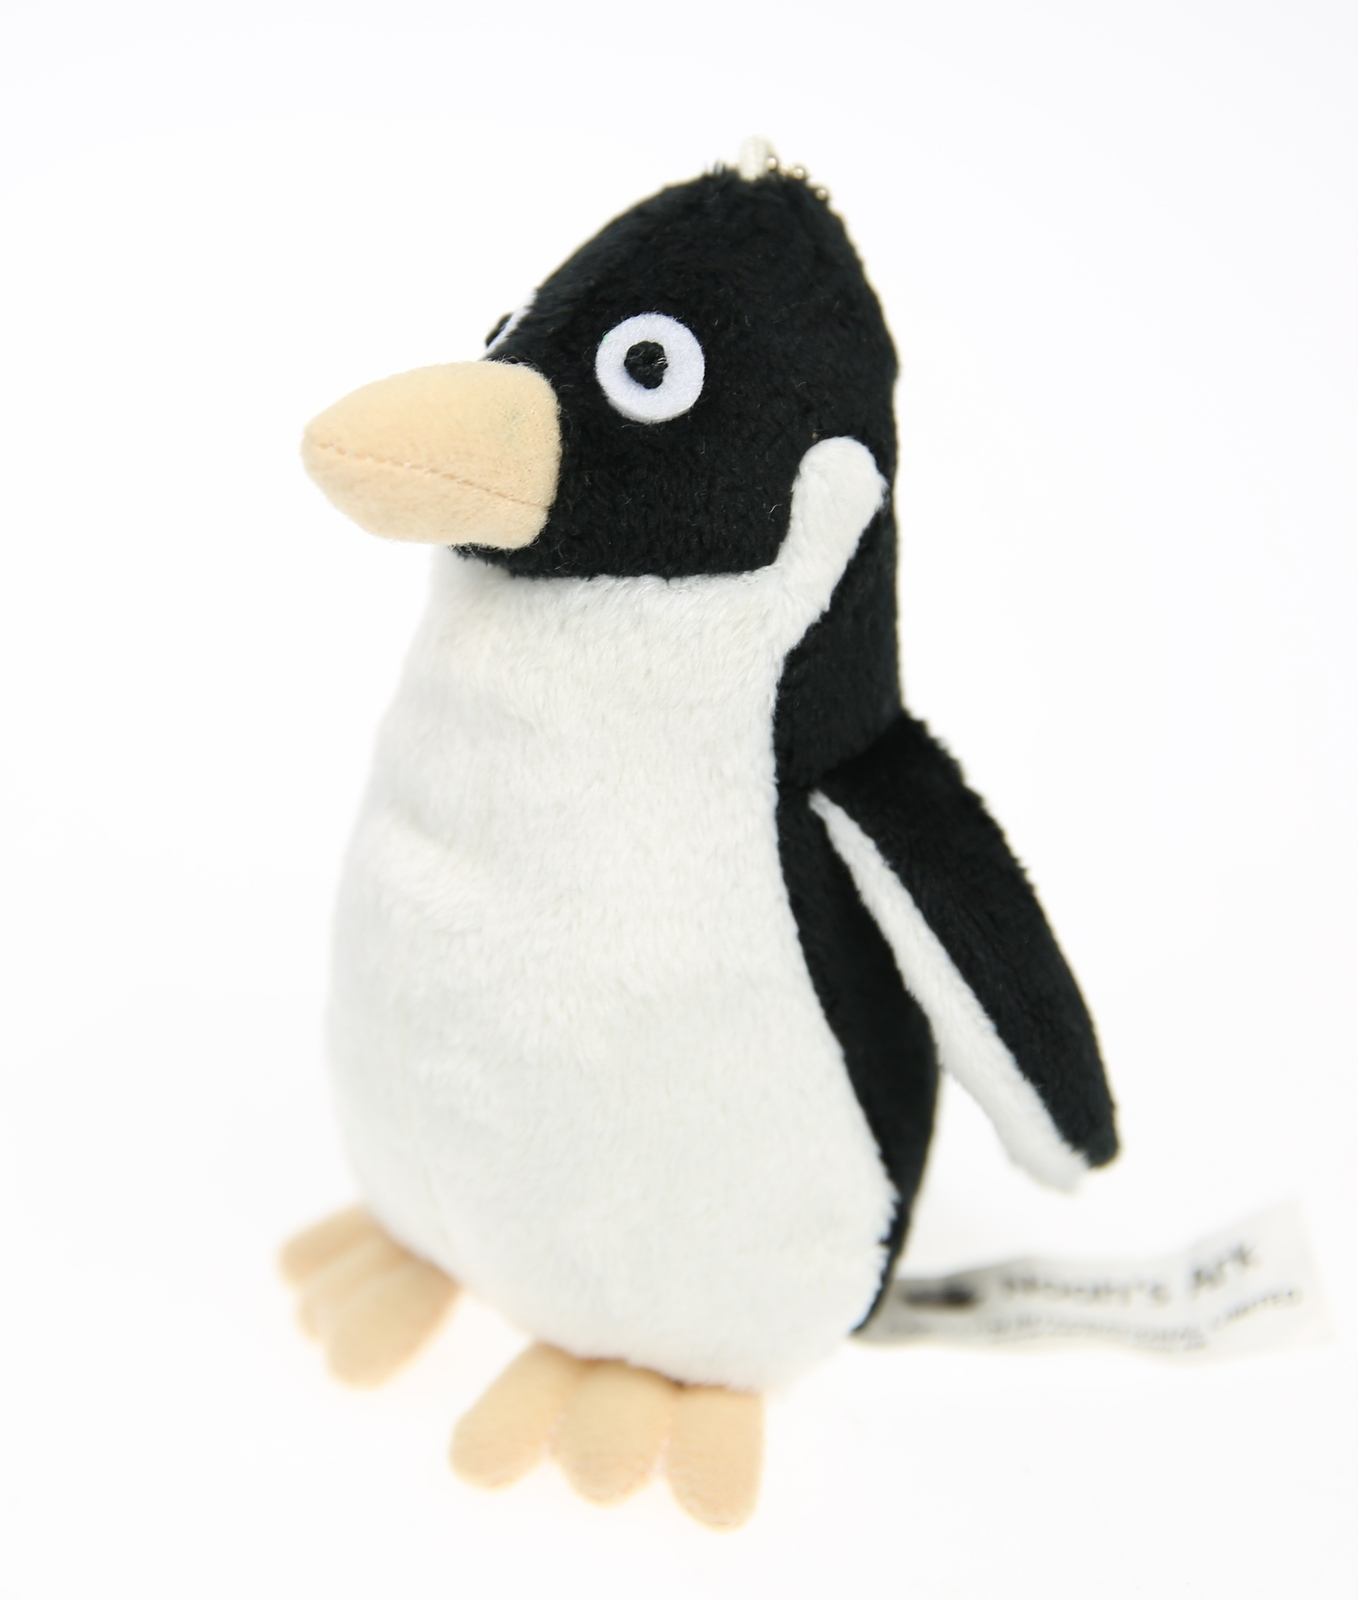 Penguin Noah's Ark Plush Toys Stuffed Toy Animal Key Chain 4 inches